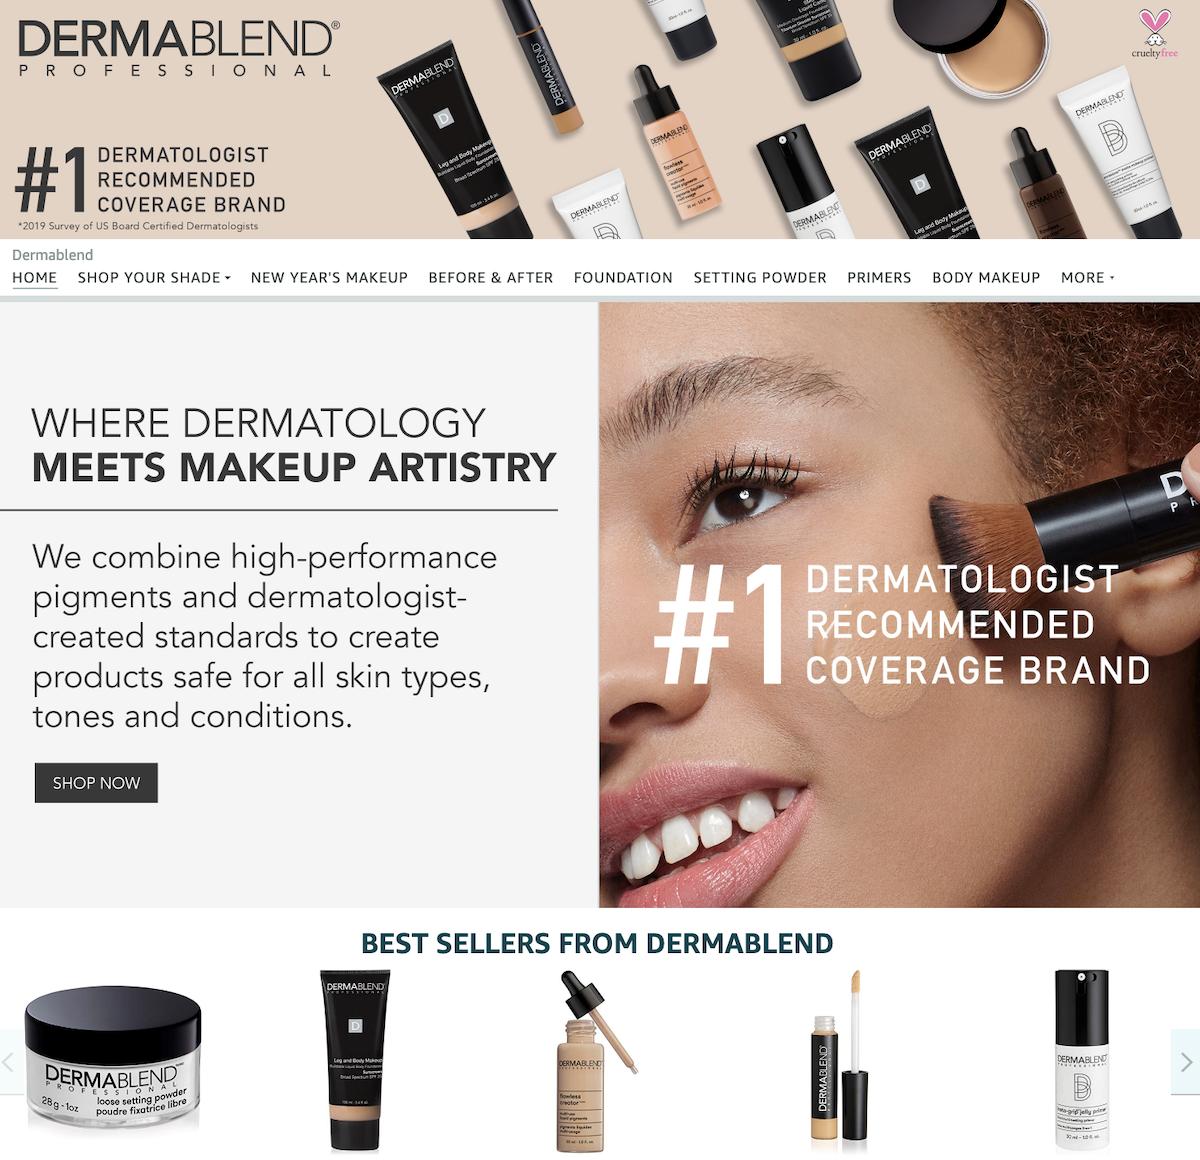 Dermablend Amazon Brand Page Screenshot Salsify Beauty Brands